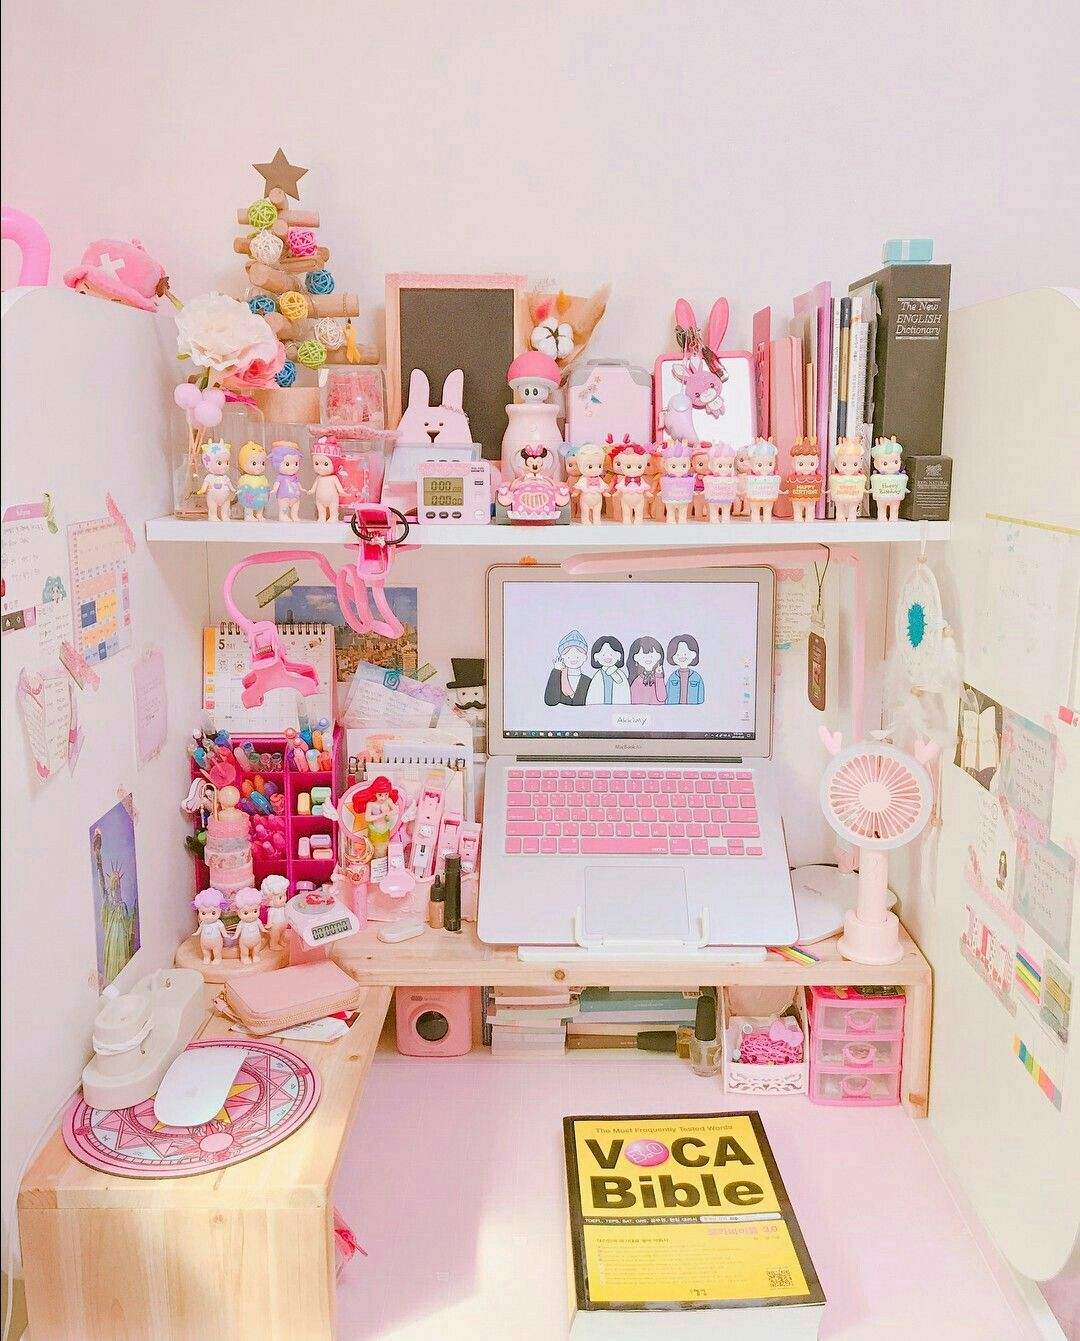 Épinglé par pinterest sur Habitaciones, oficinas, productos